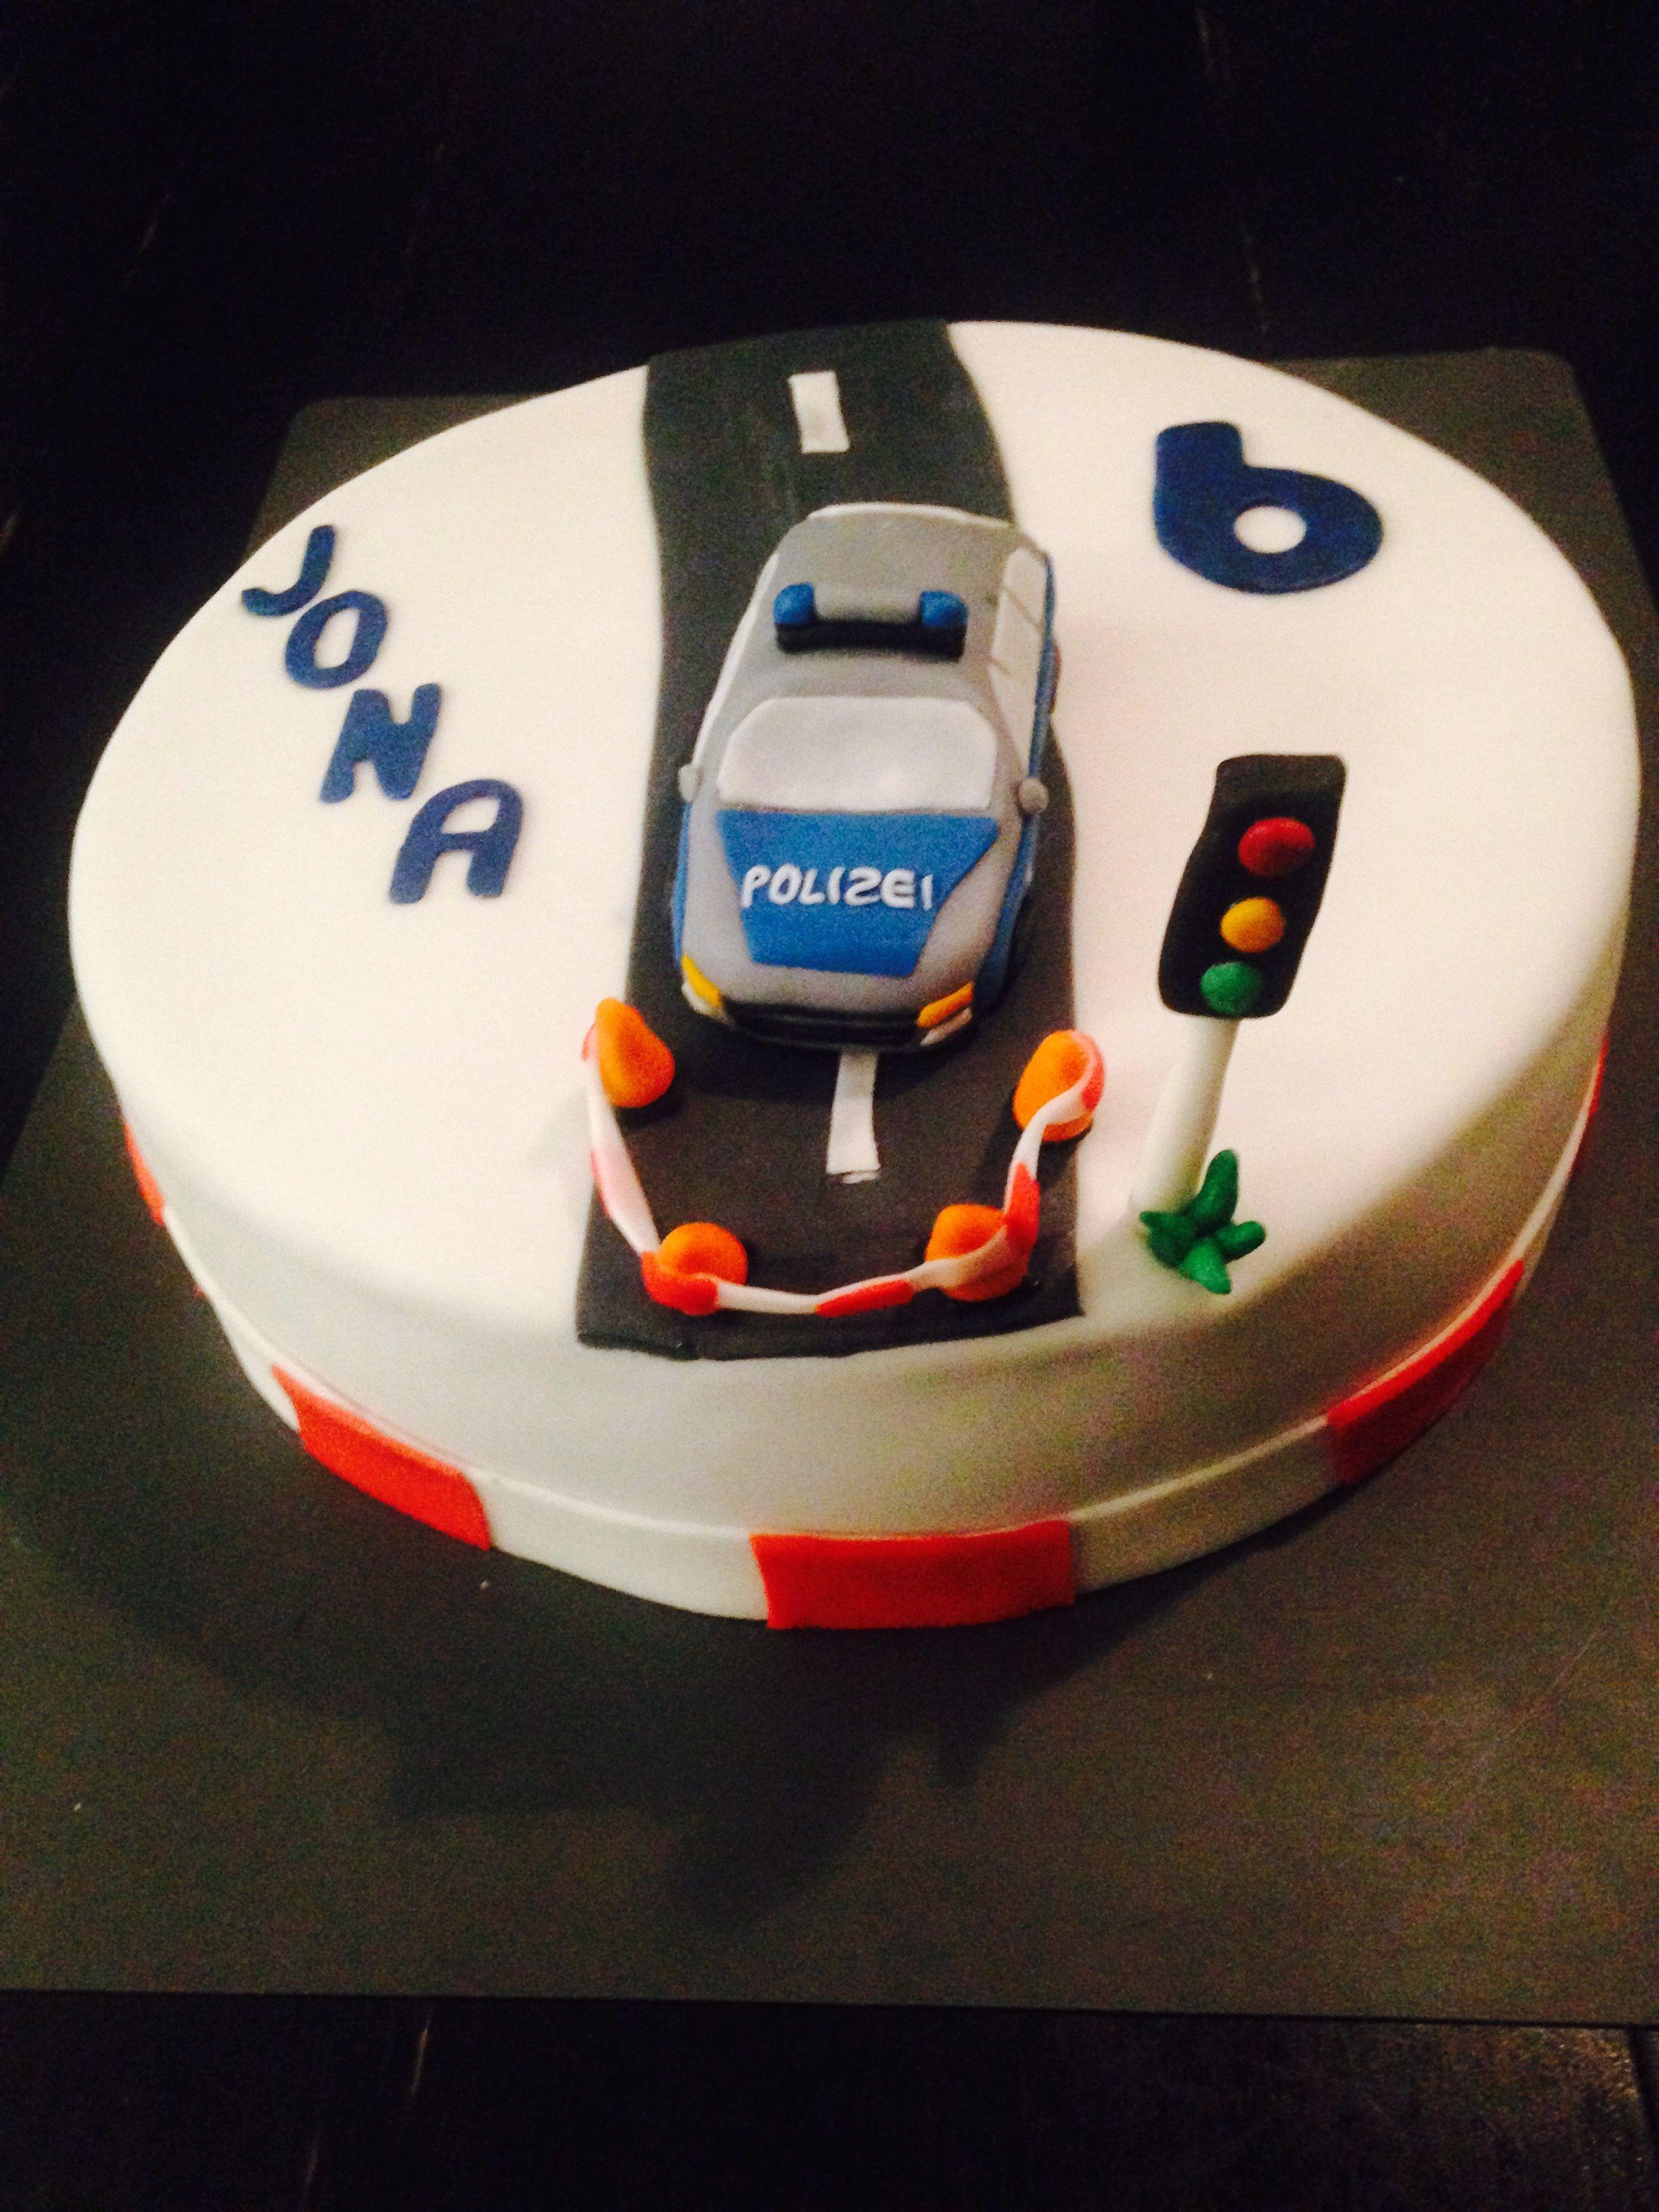 Polizei Torte Police cake